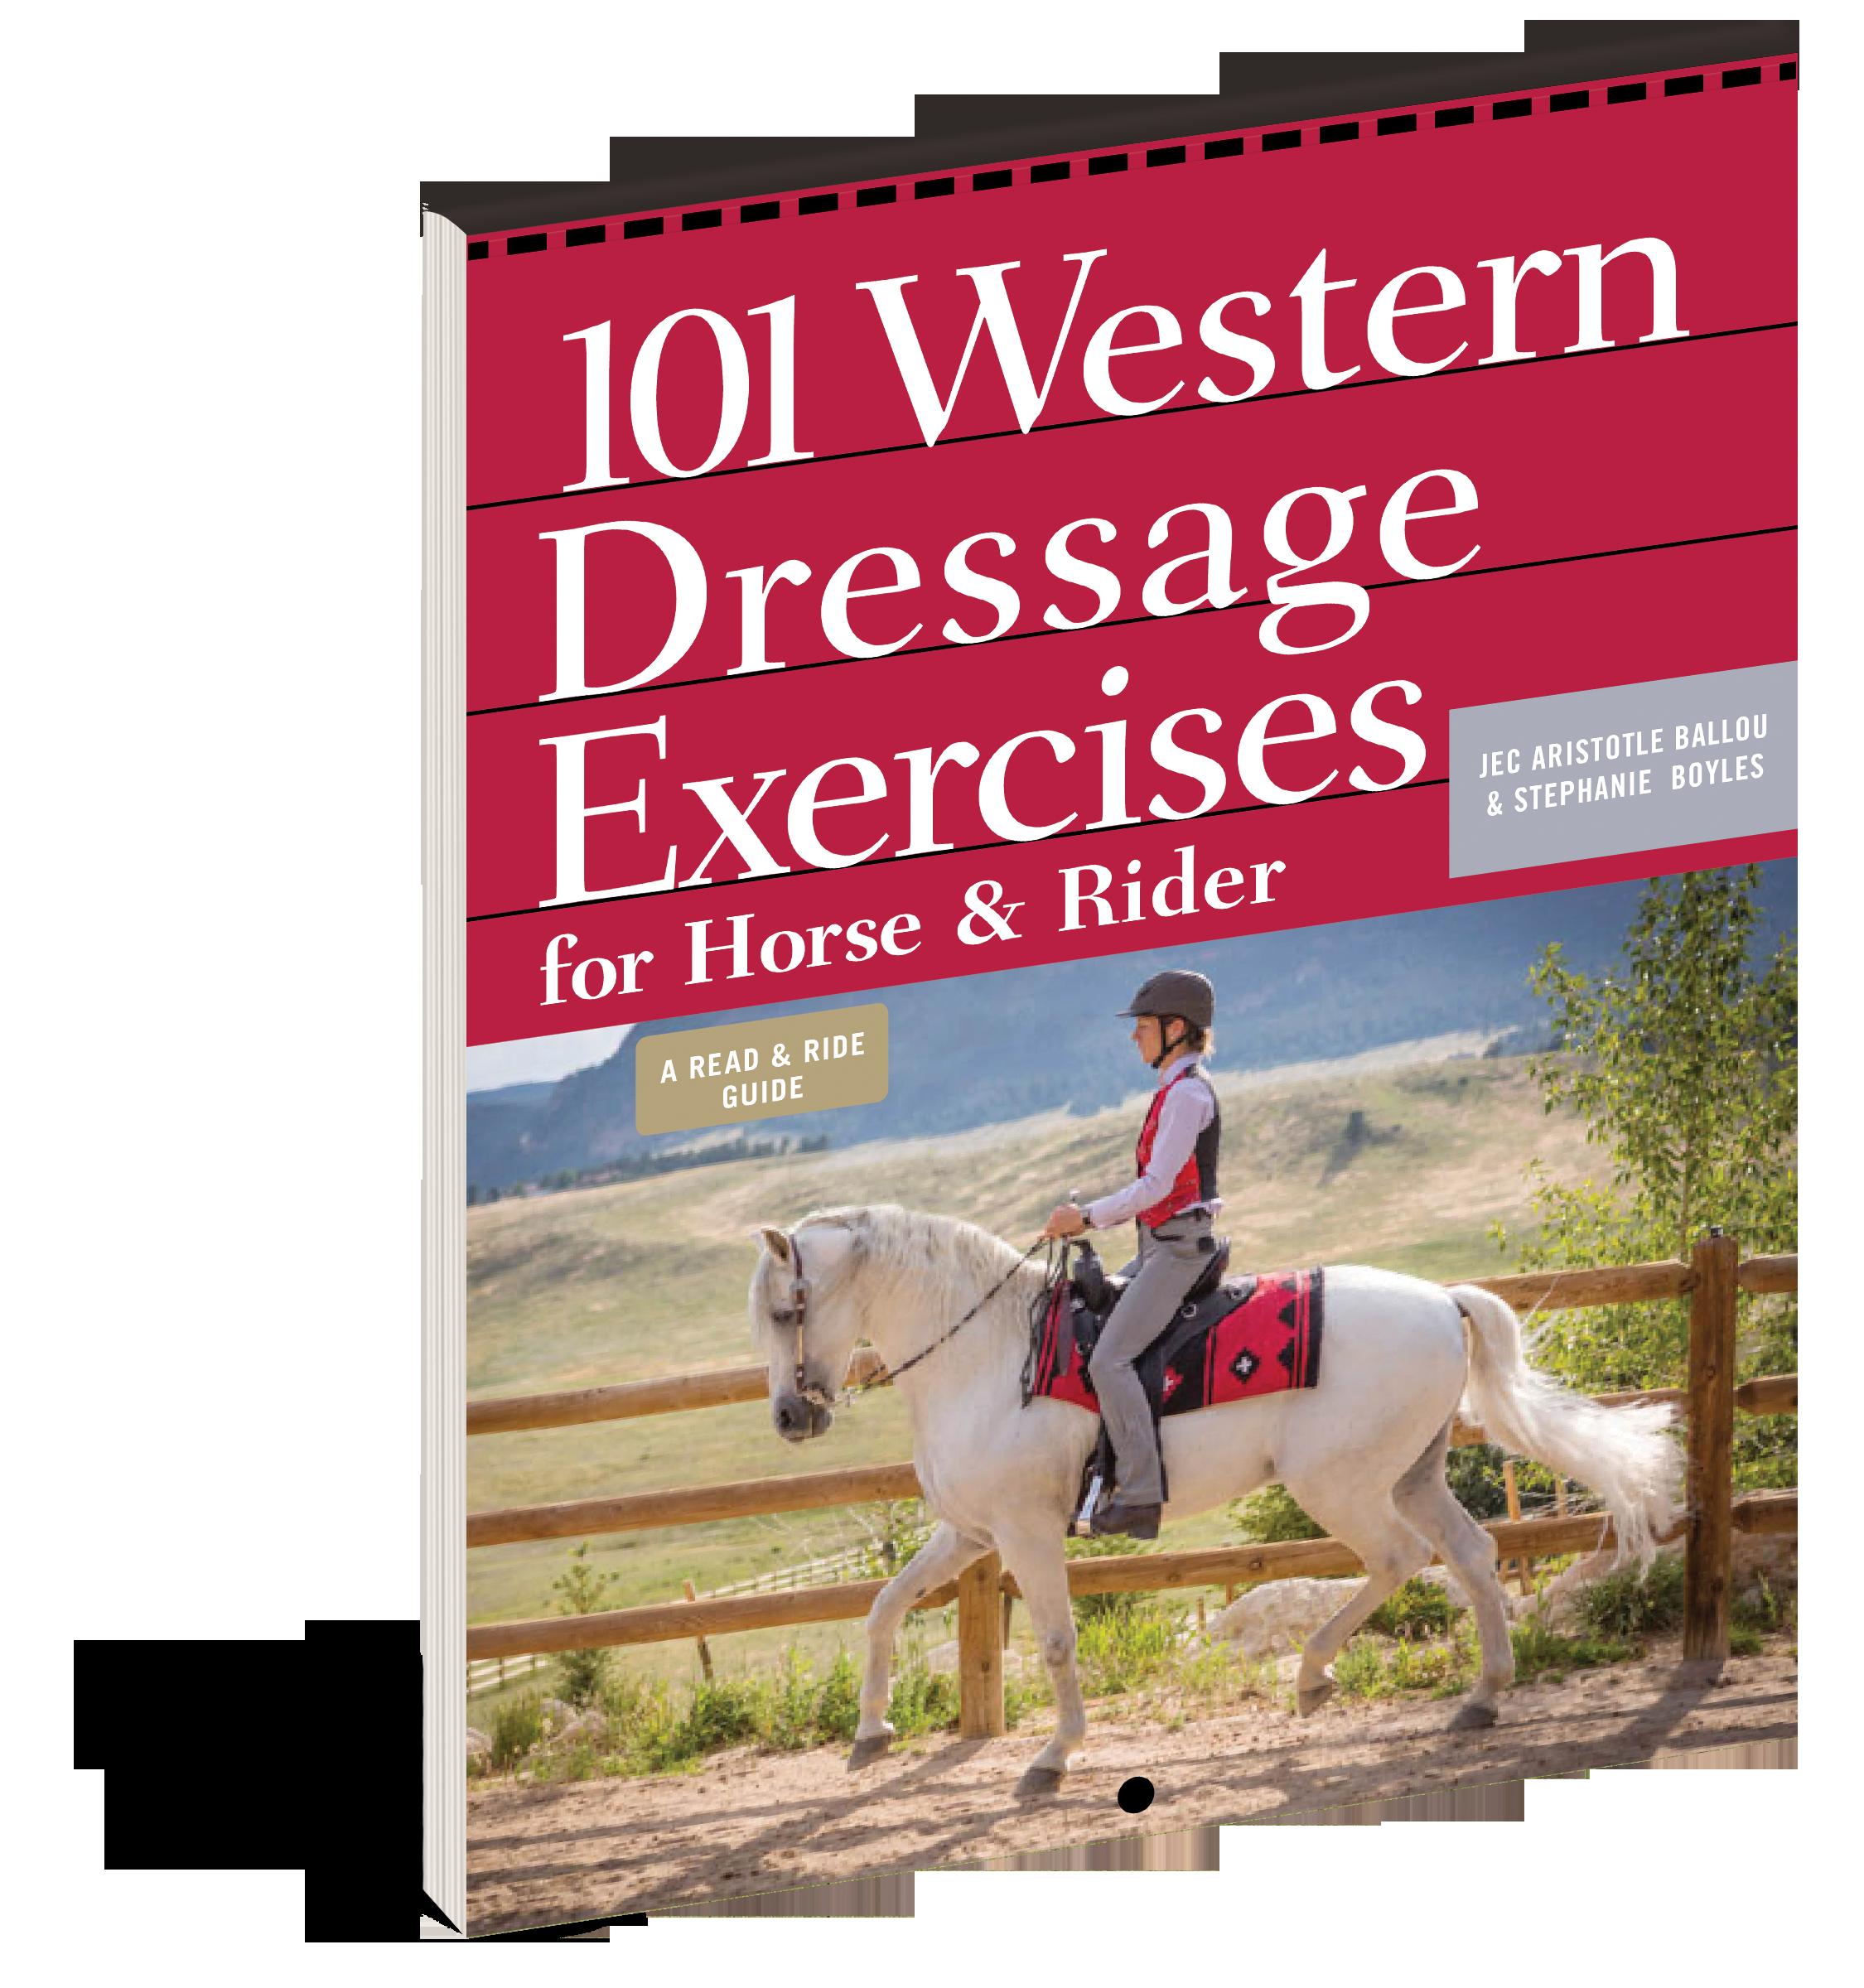 101 Western Dressage Exercises For Horse Rider Workman Publishing